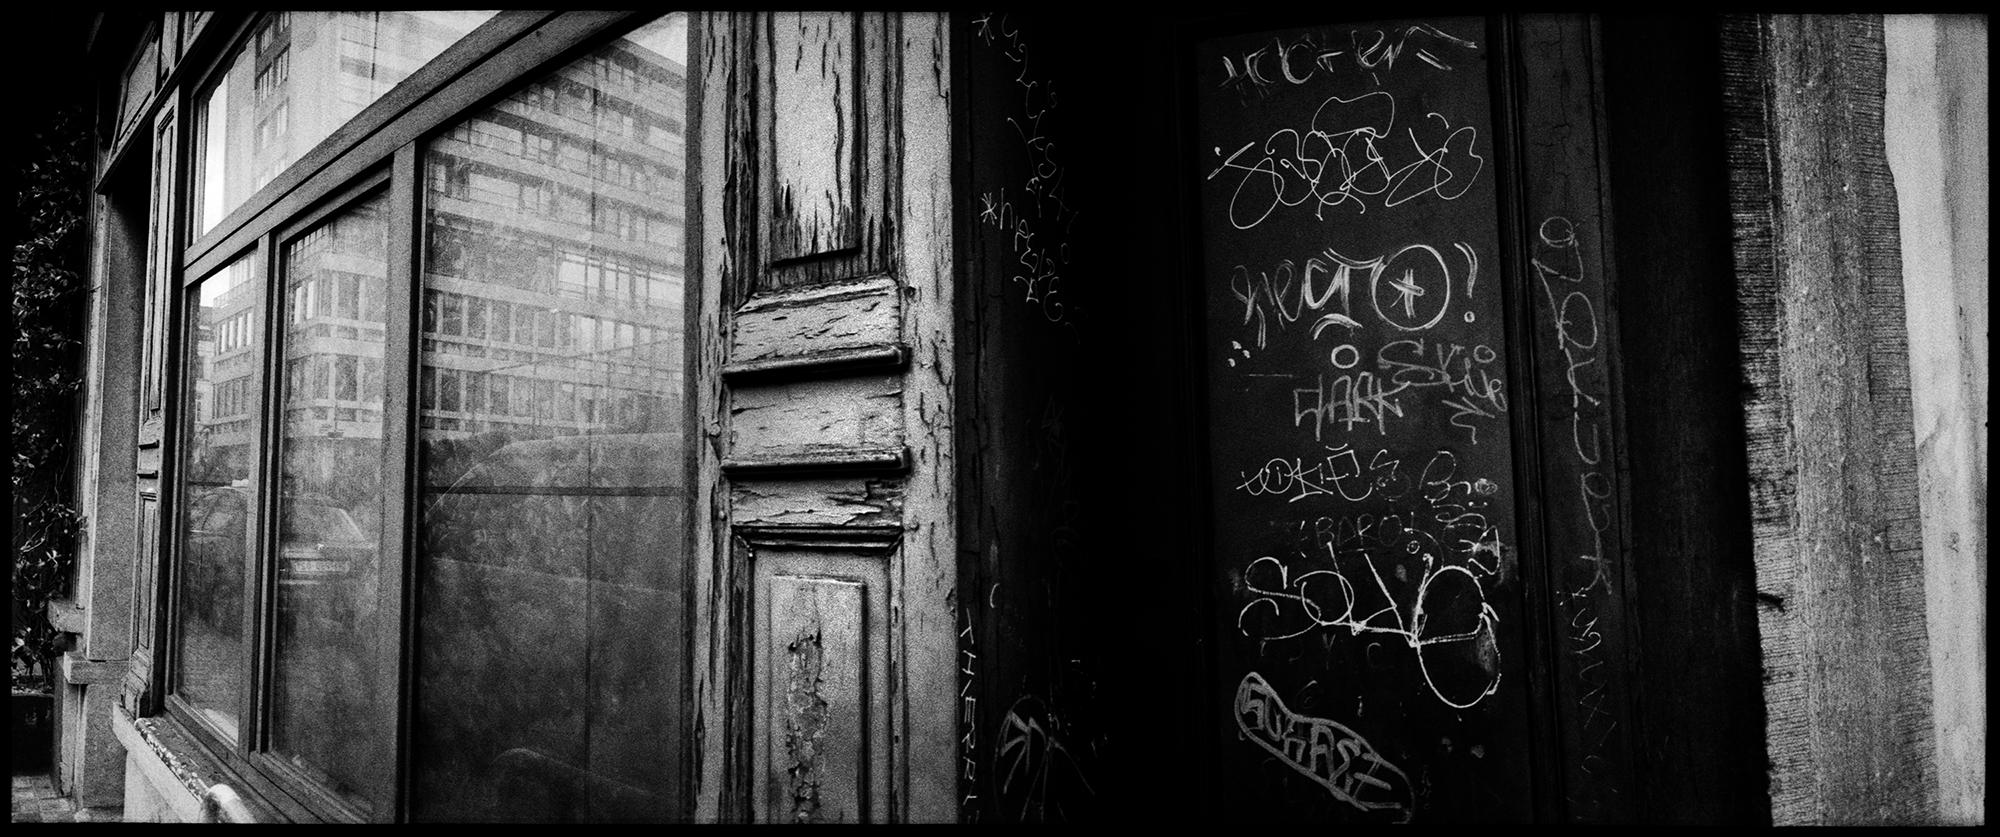 Brussels, Belgium by Laurent Orseau #78